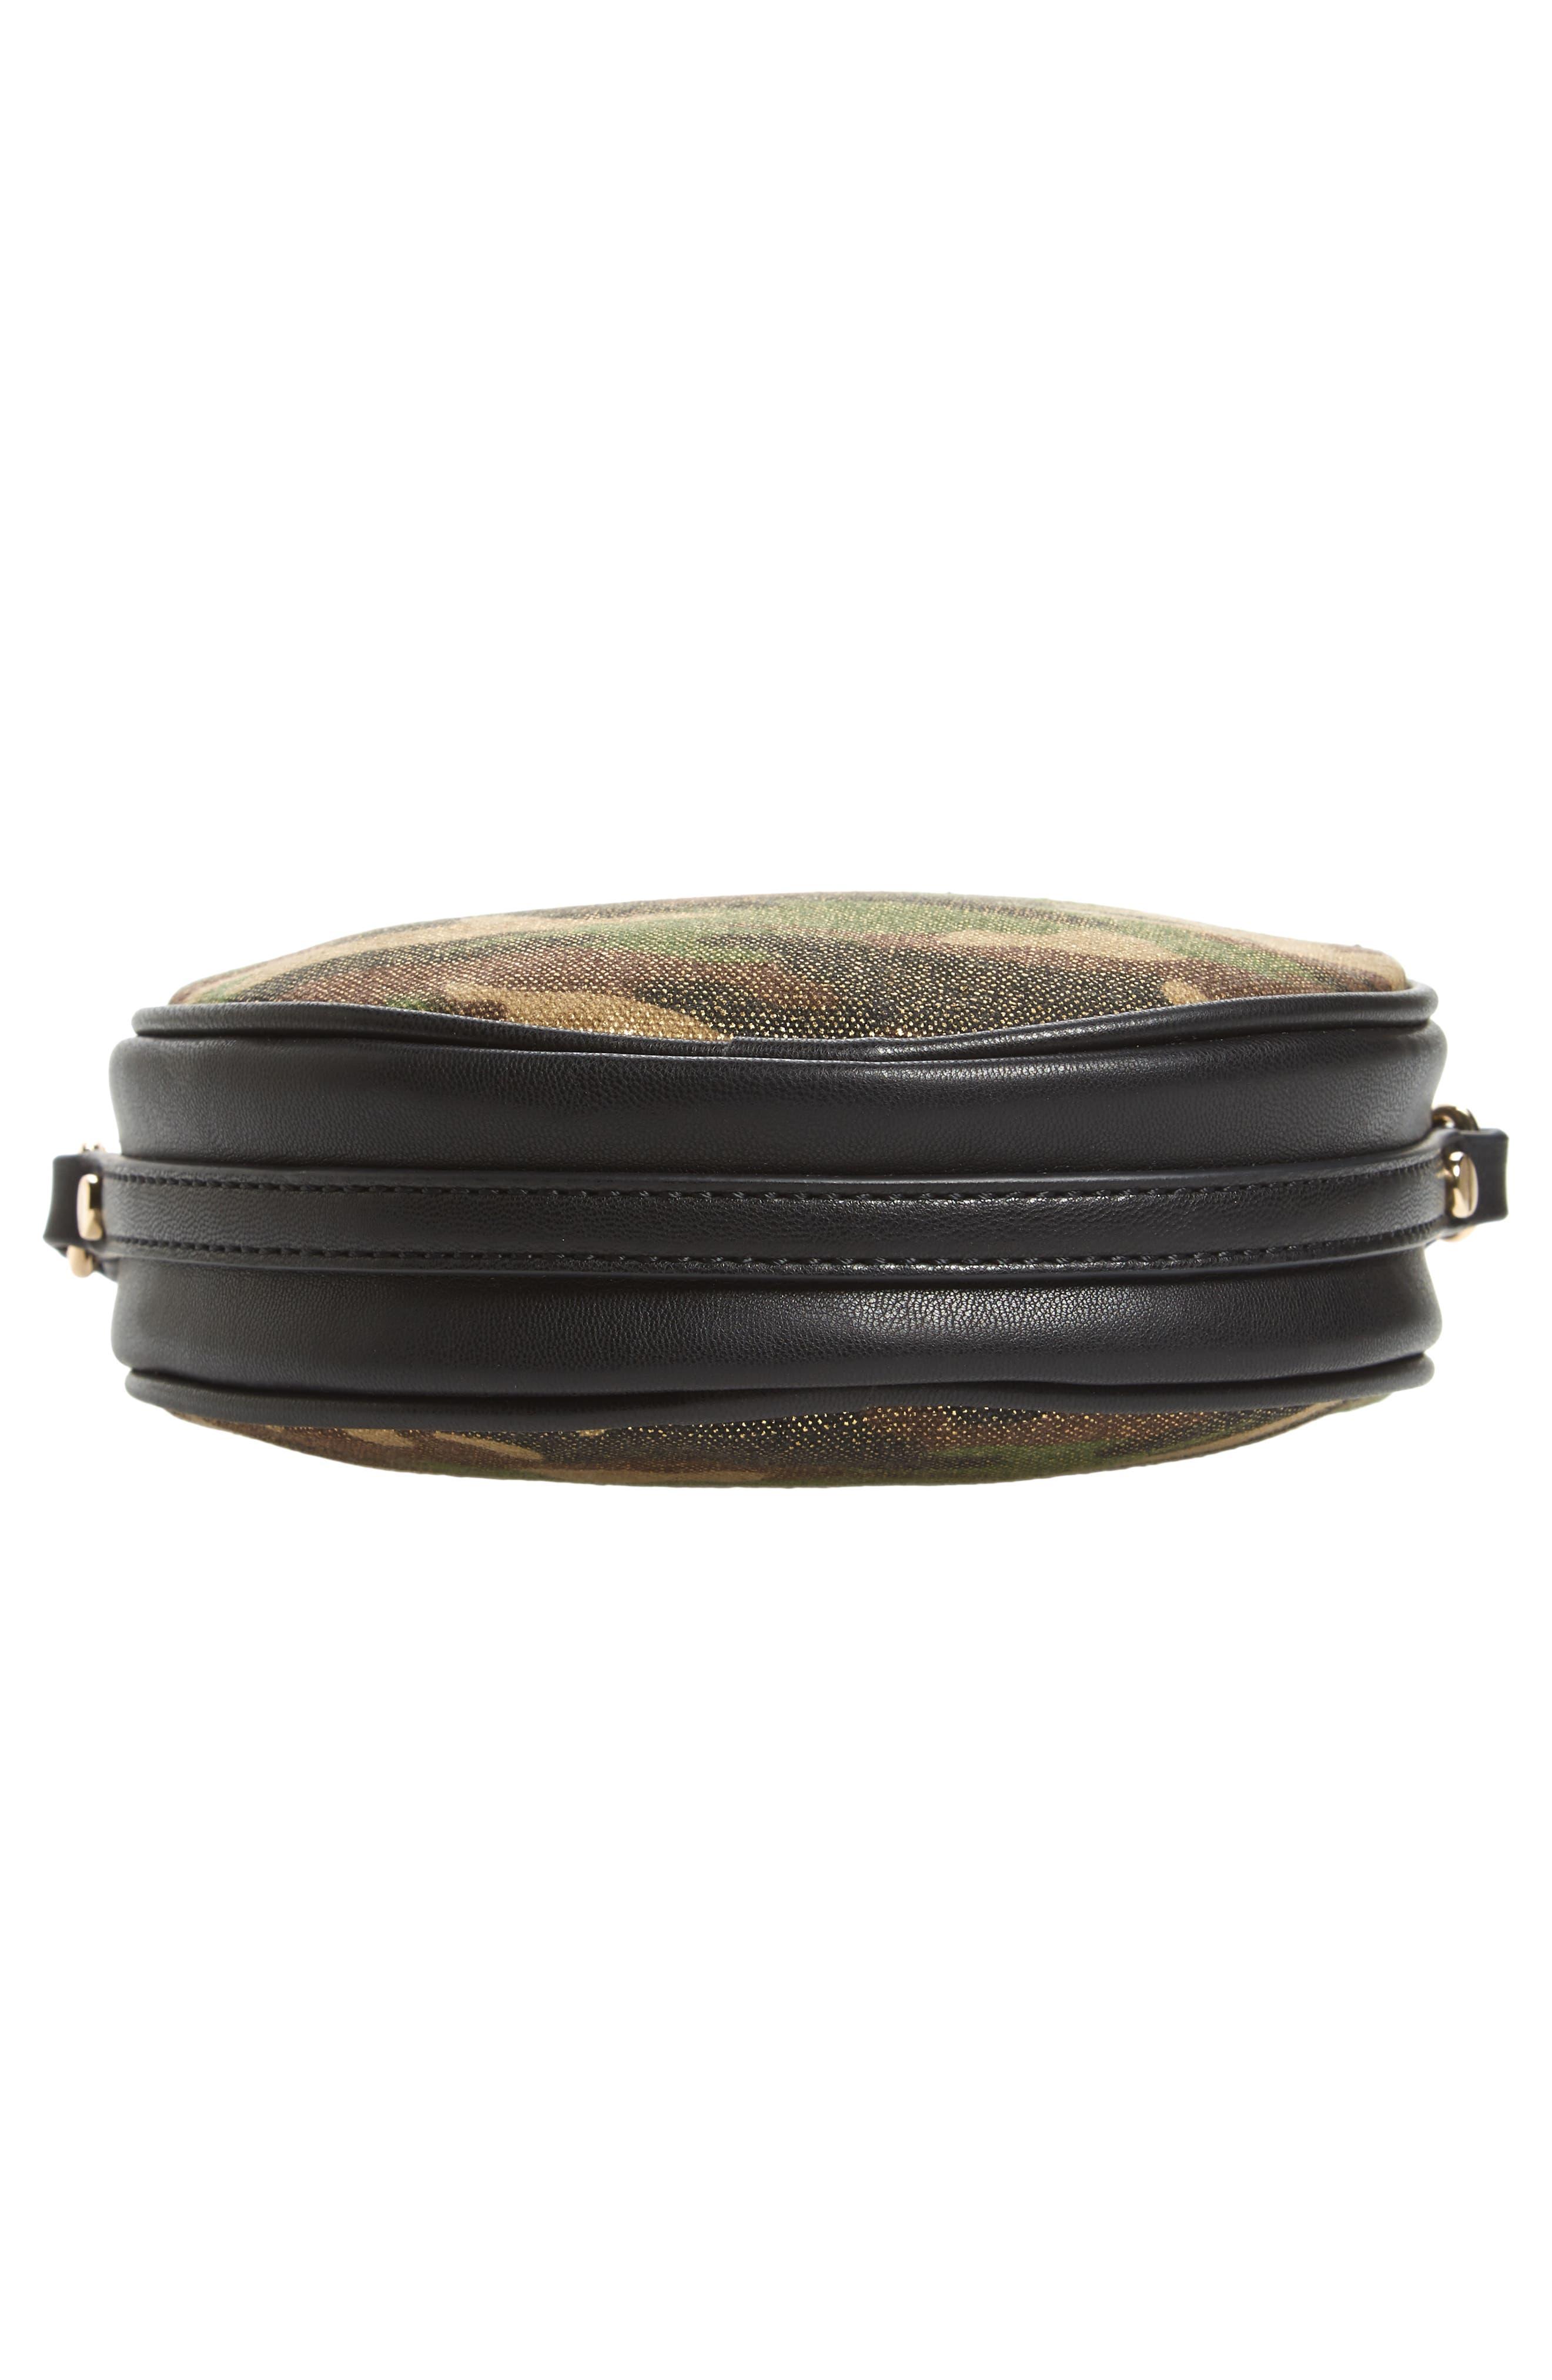 Mali + Lili Camouflage Vegan Leather Canteen Crossbody Bag,                             Alternate thumbnail 6, color,                             340